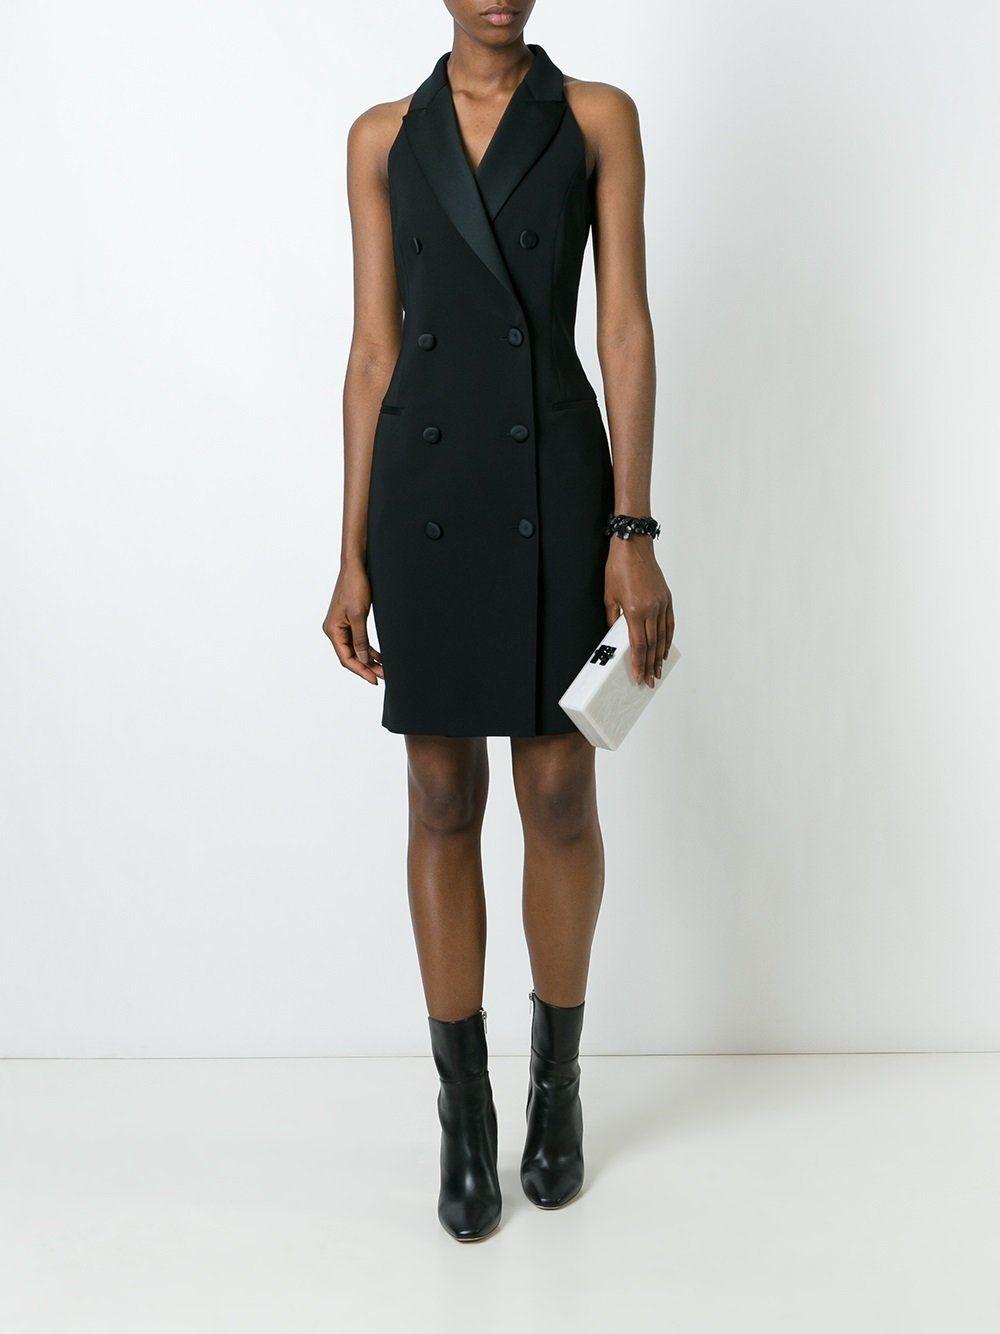 cb4d58cf6a6 Moschino sleeveless tuxedo dress